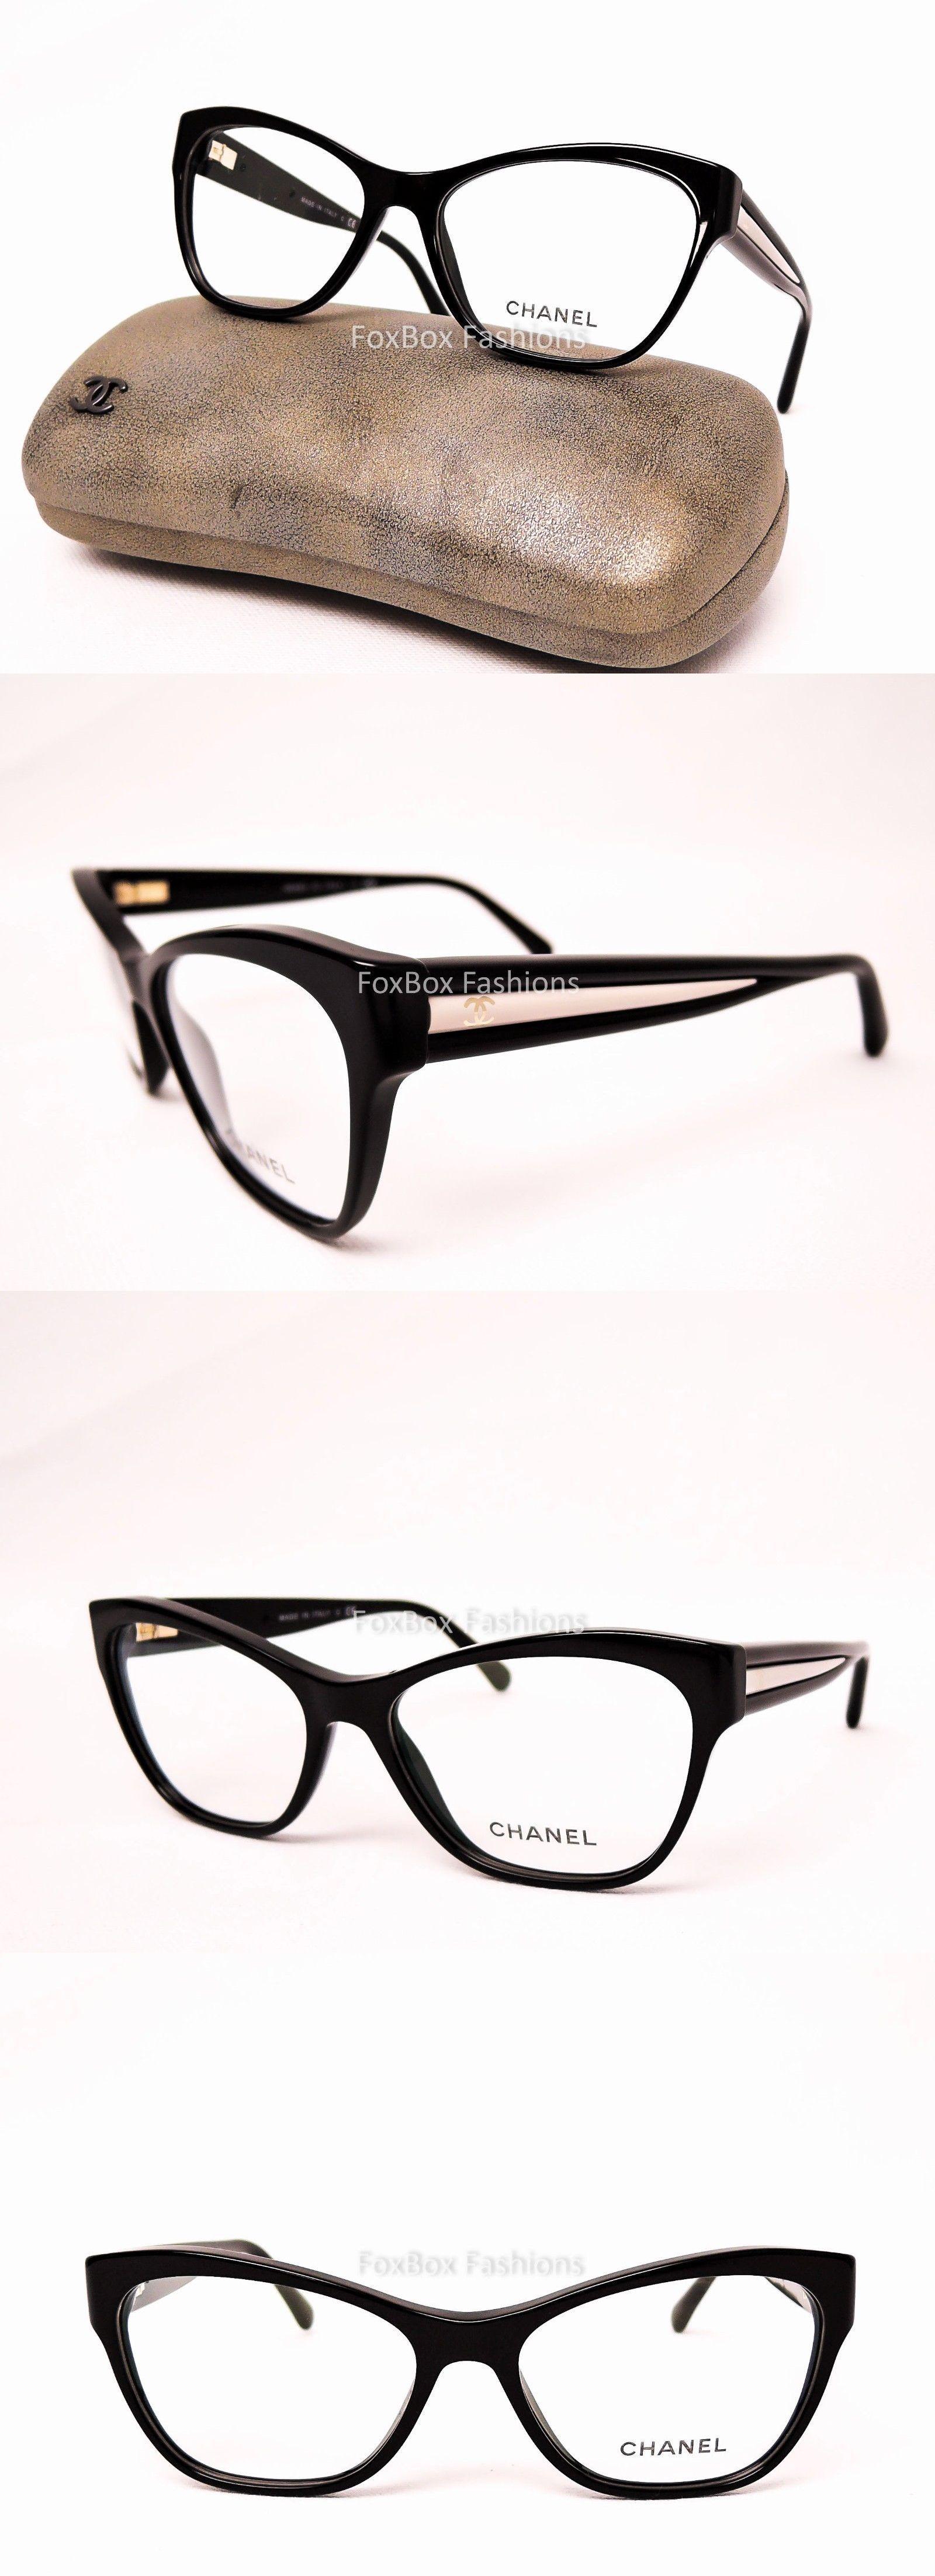 Eyeglass Frames: Chanel 3307 943 Eyeglasses Optical Frames Glasses ...